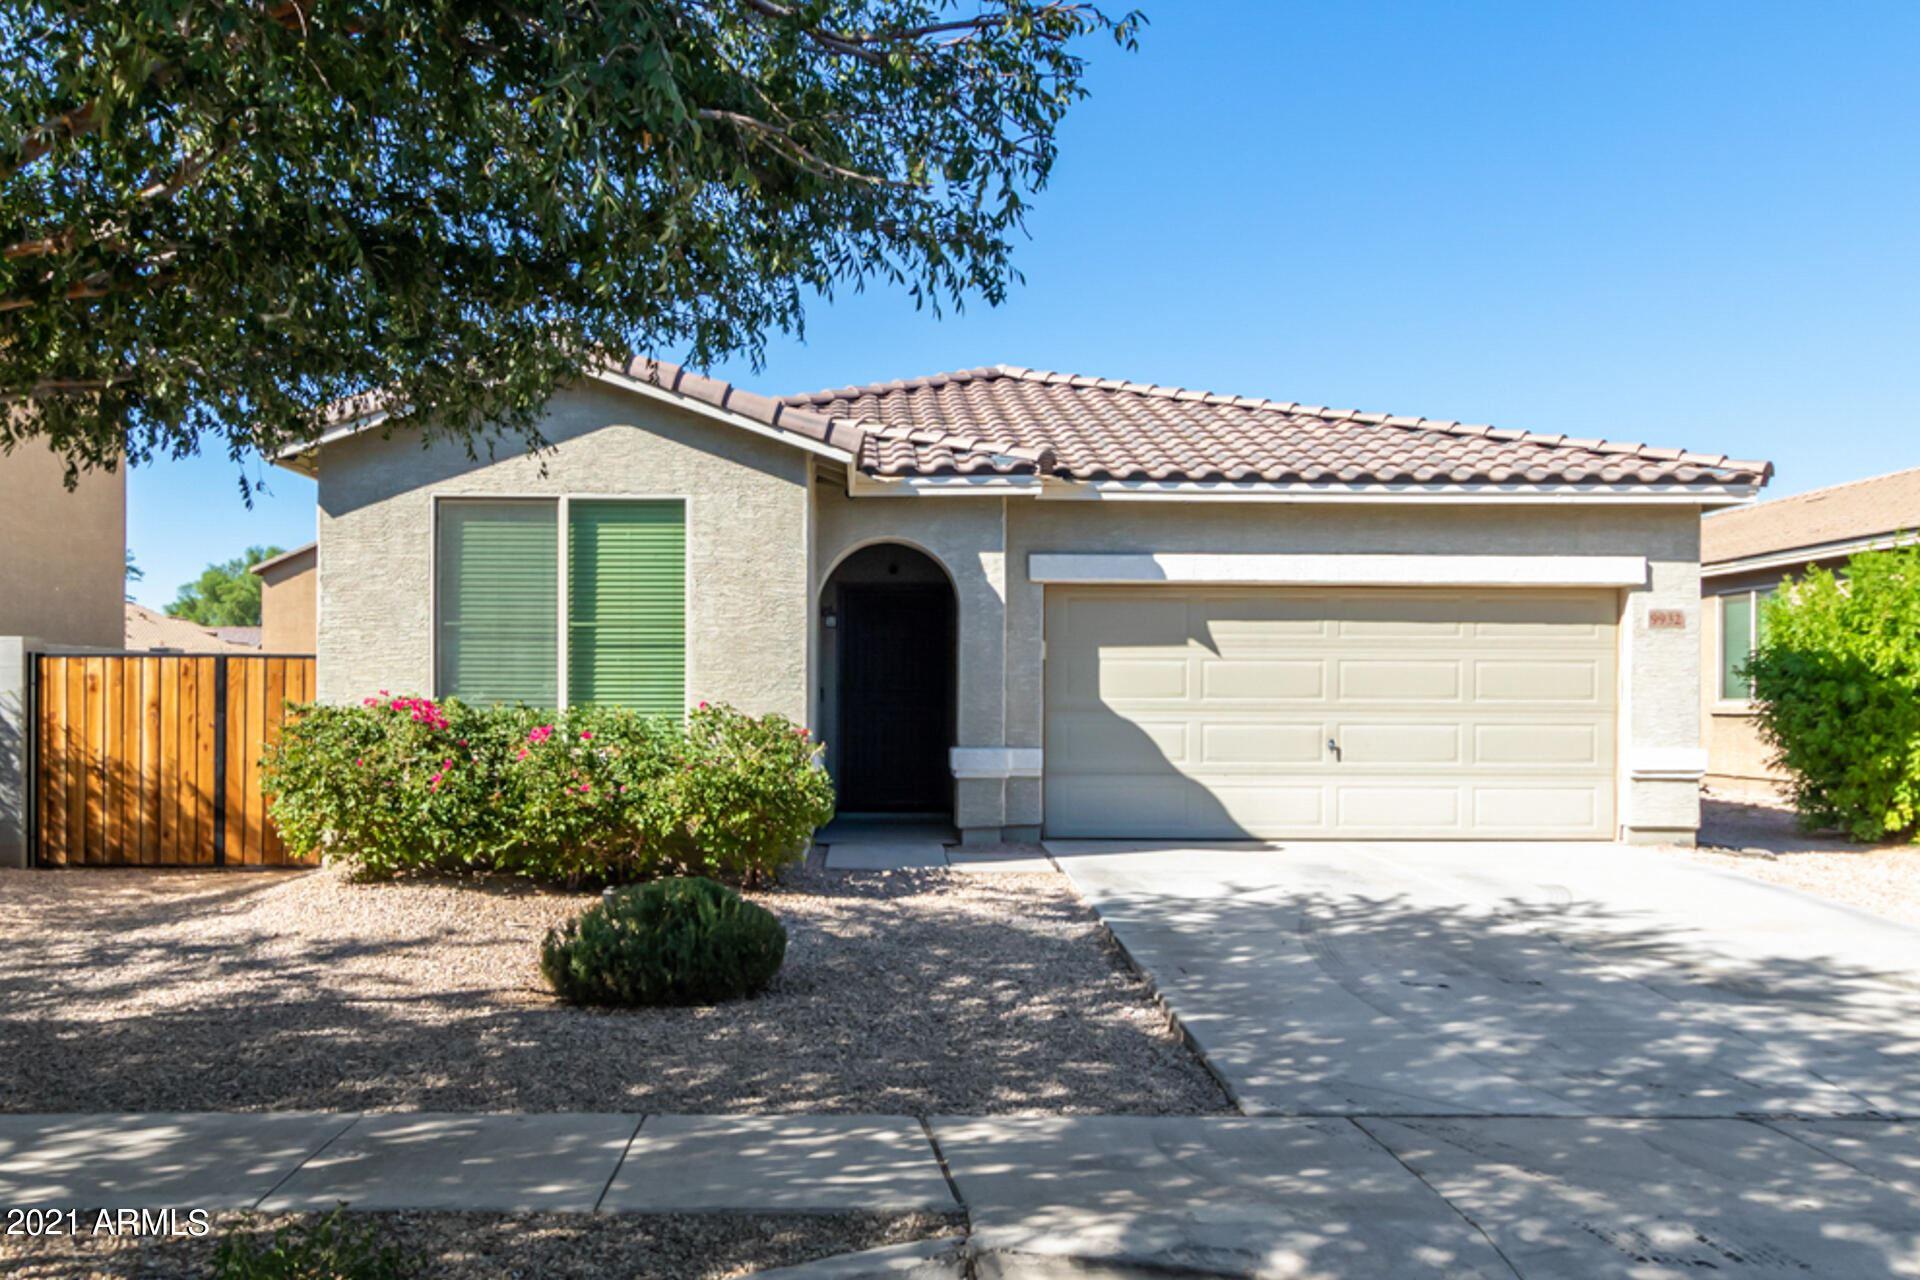 9932 W WHYMAN Avenue, Tolleson, AZ 85353 - MLS#: 6296889